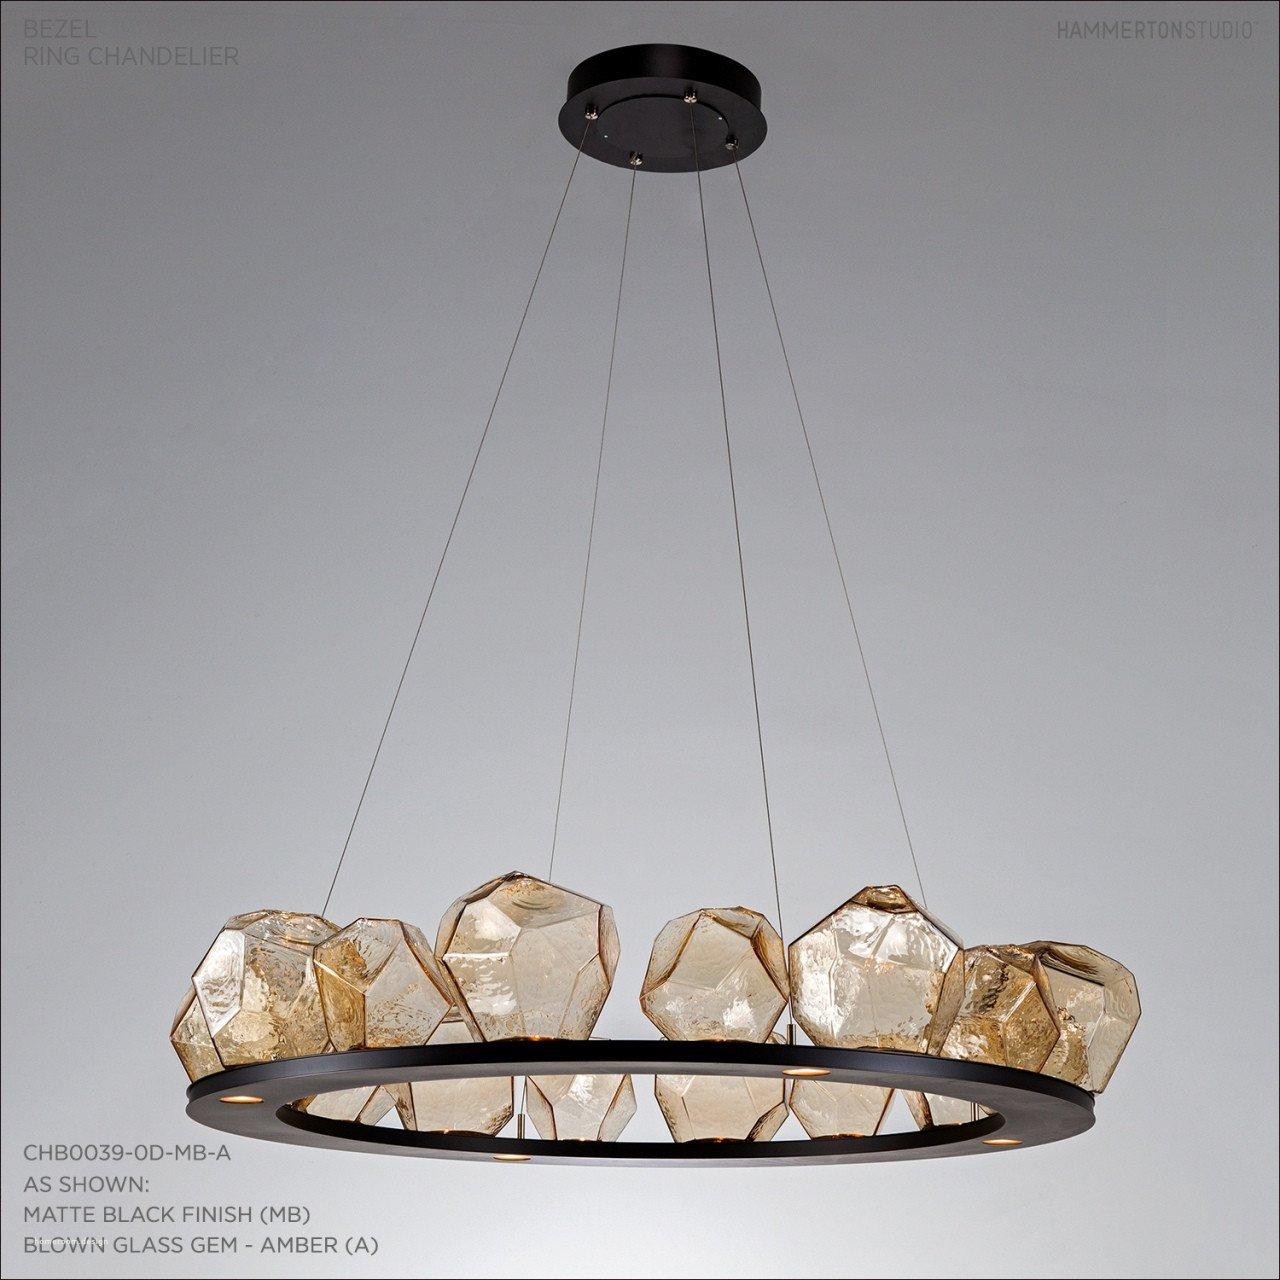 Bedroom Ceiling Light Ideas Best Of Bedroom Ceiling Lights — Procura Home Blog